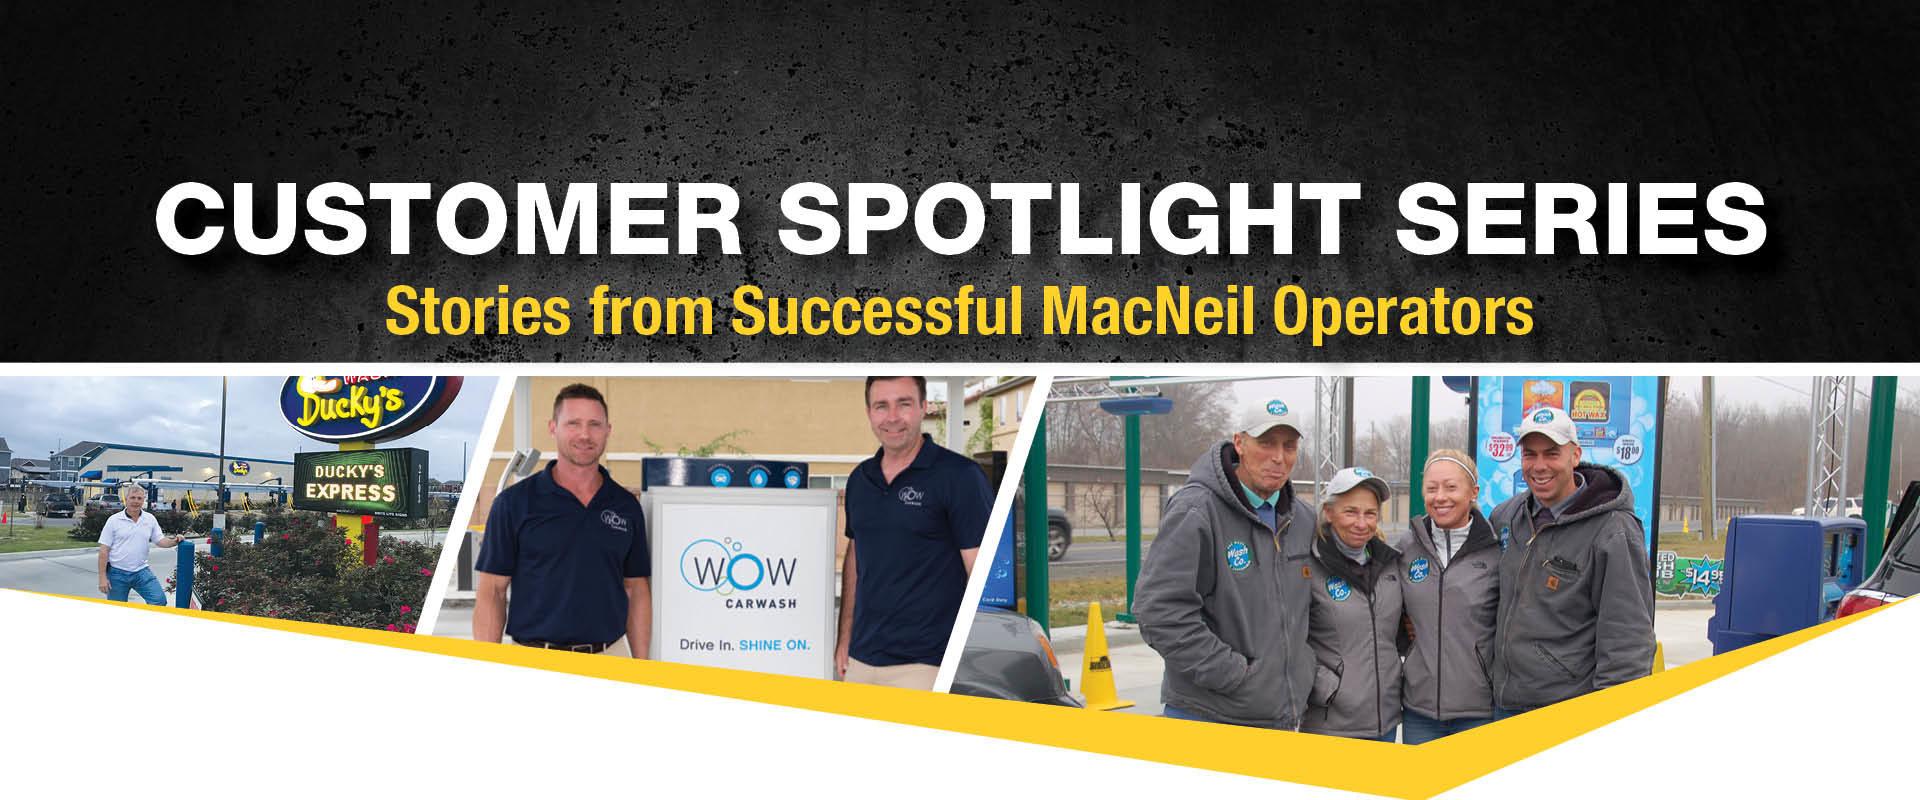 MacNeil Wash Systems Customer Spotlight Series; success stories from MacNeil Operators